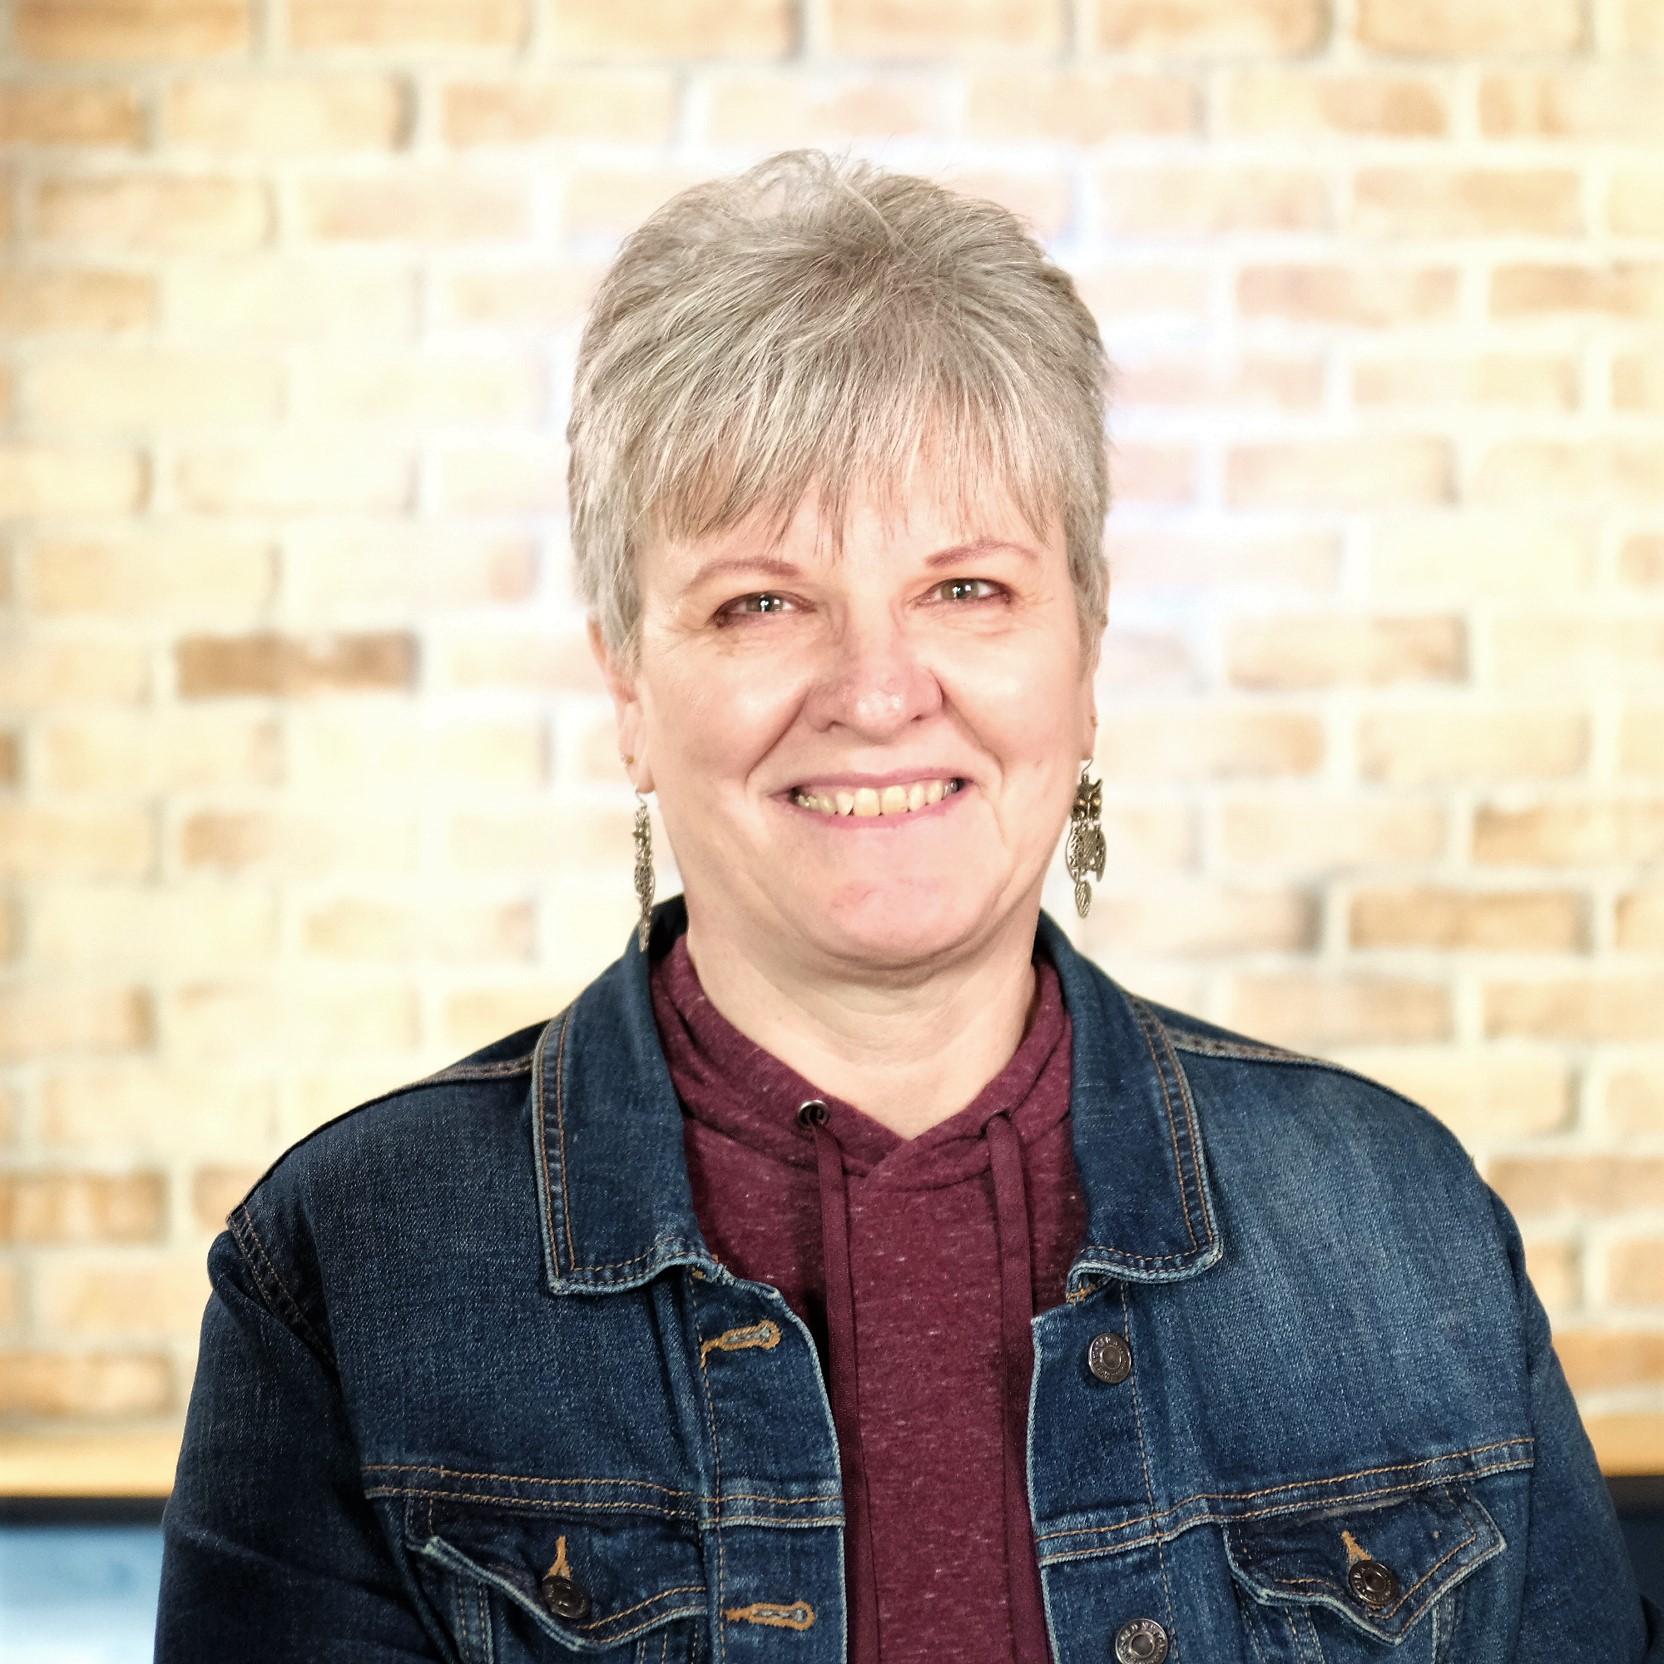 Kathy Silvertooth